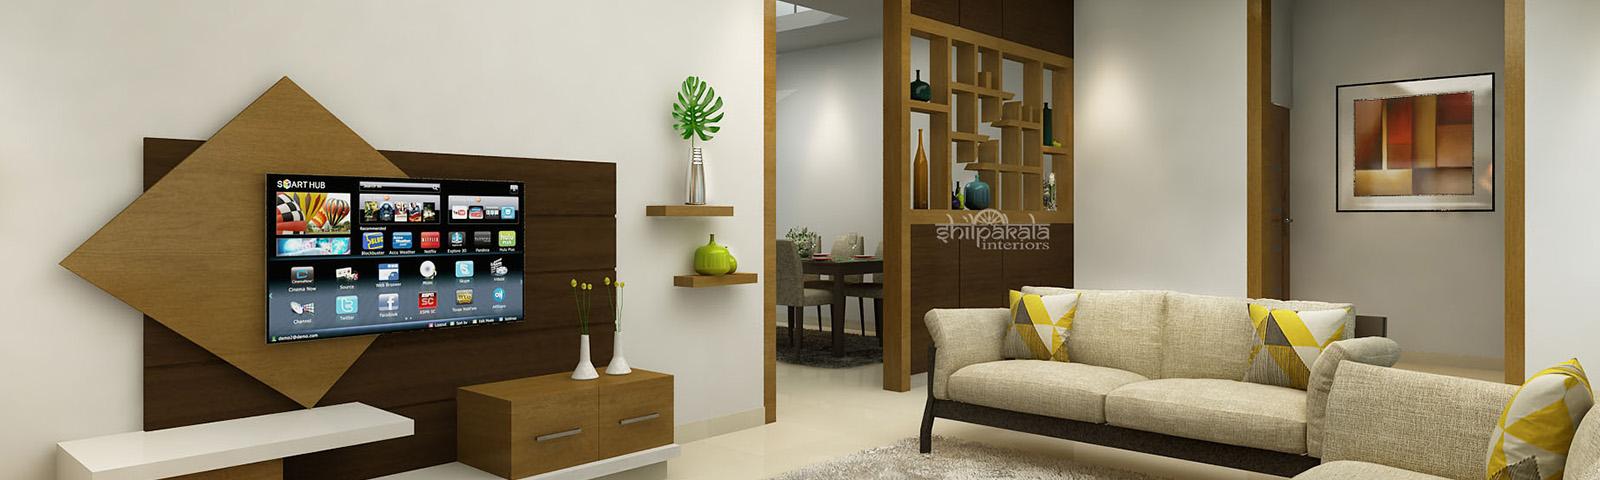 Beautiful Interior Designs Beautiful Home Interior Designs With Well  Beautiful Interior Designs Beautiful Home Interior Designs With Well Home  Interior ...